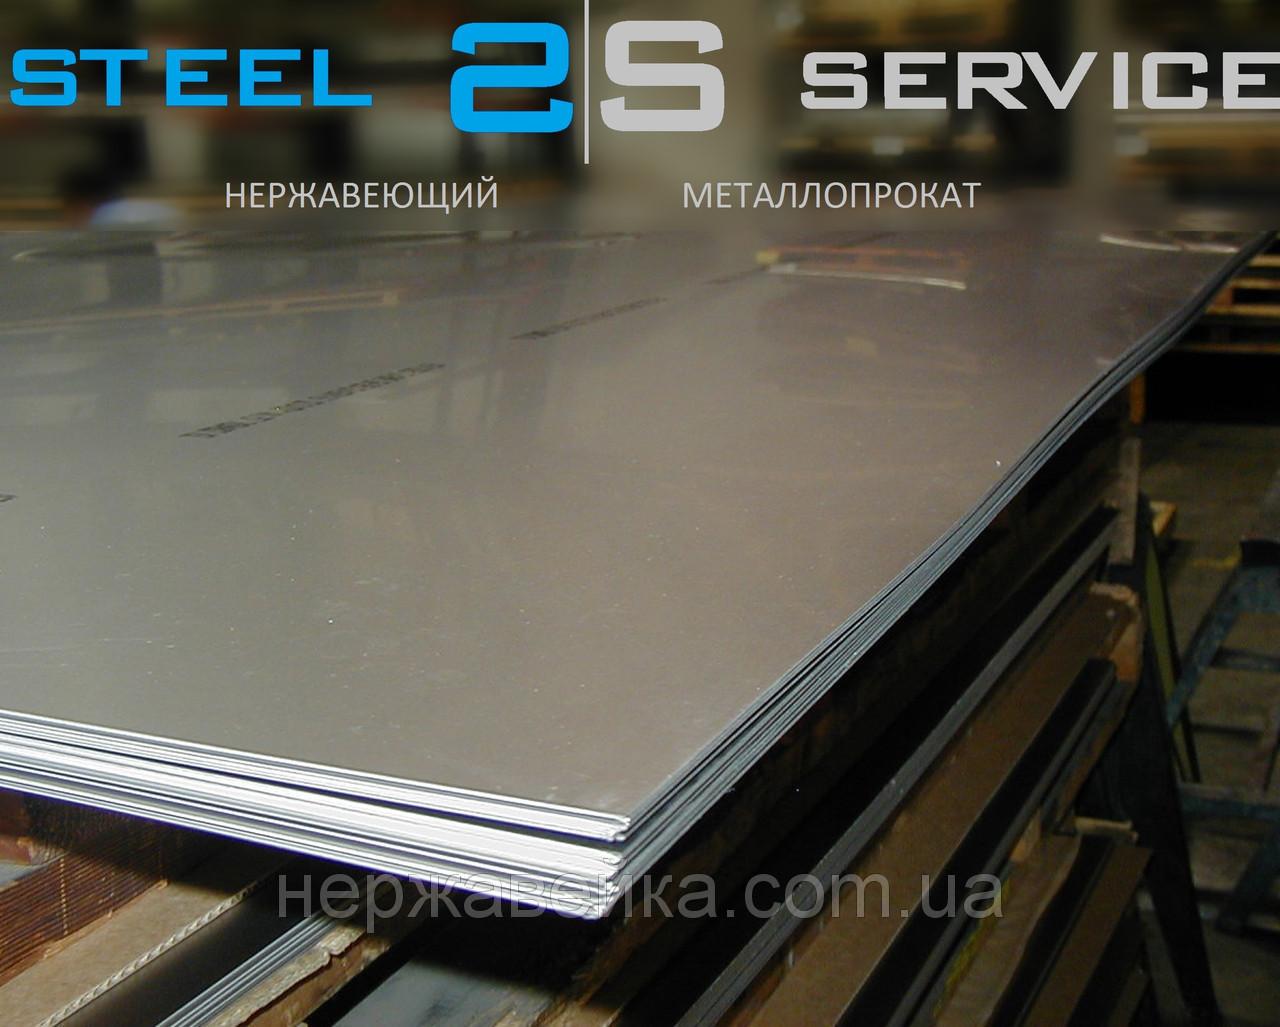 Листовая нержавейка 3х1250х2500мм AiSi 201  (12Х15Г9НД) 4N - шлифованный